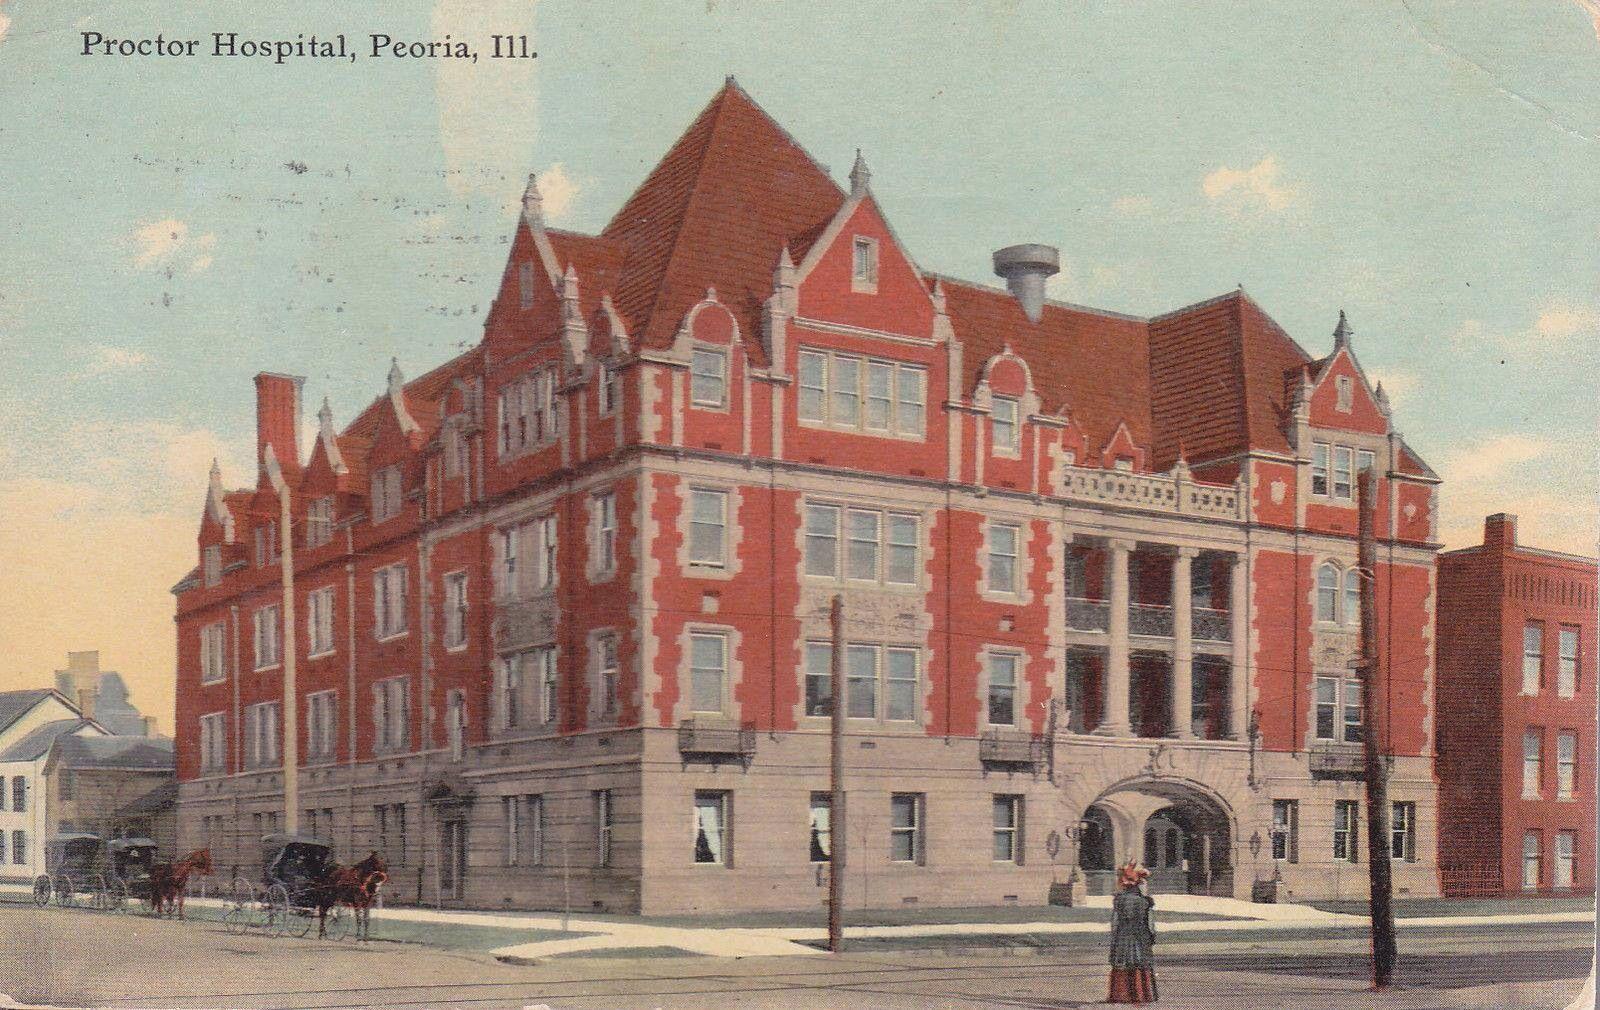 old proctor hospital peoria il where i was born in 1955 peoria rh pinterest com